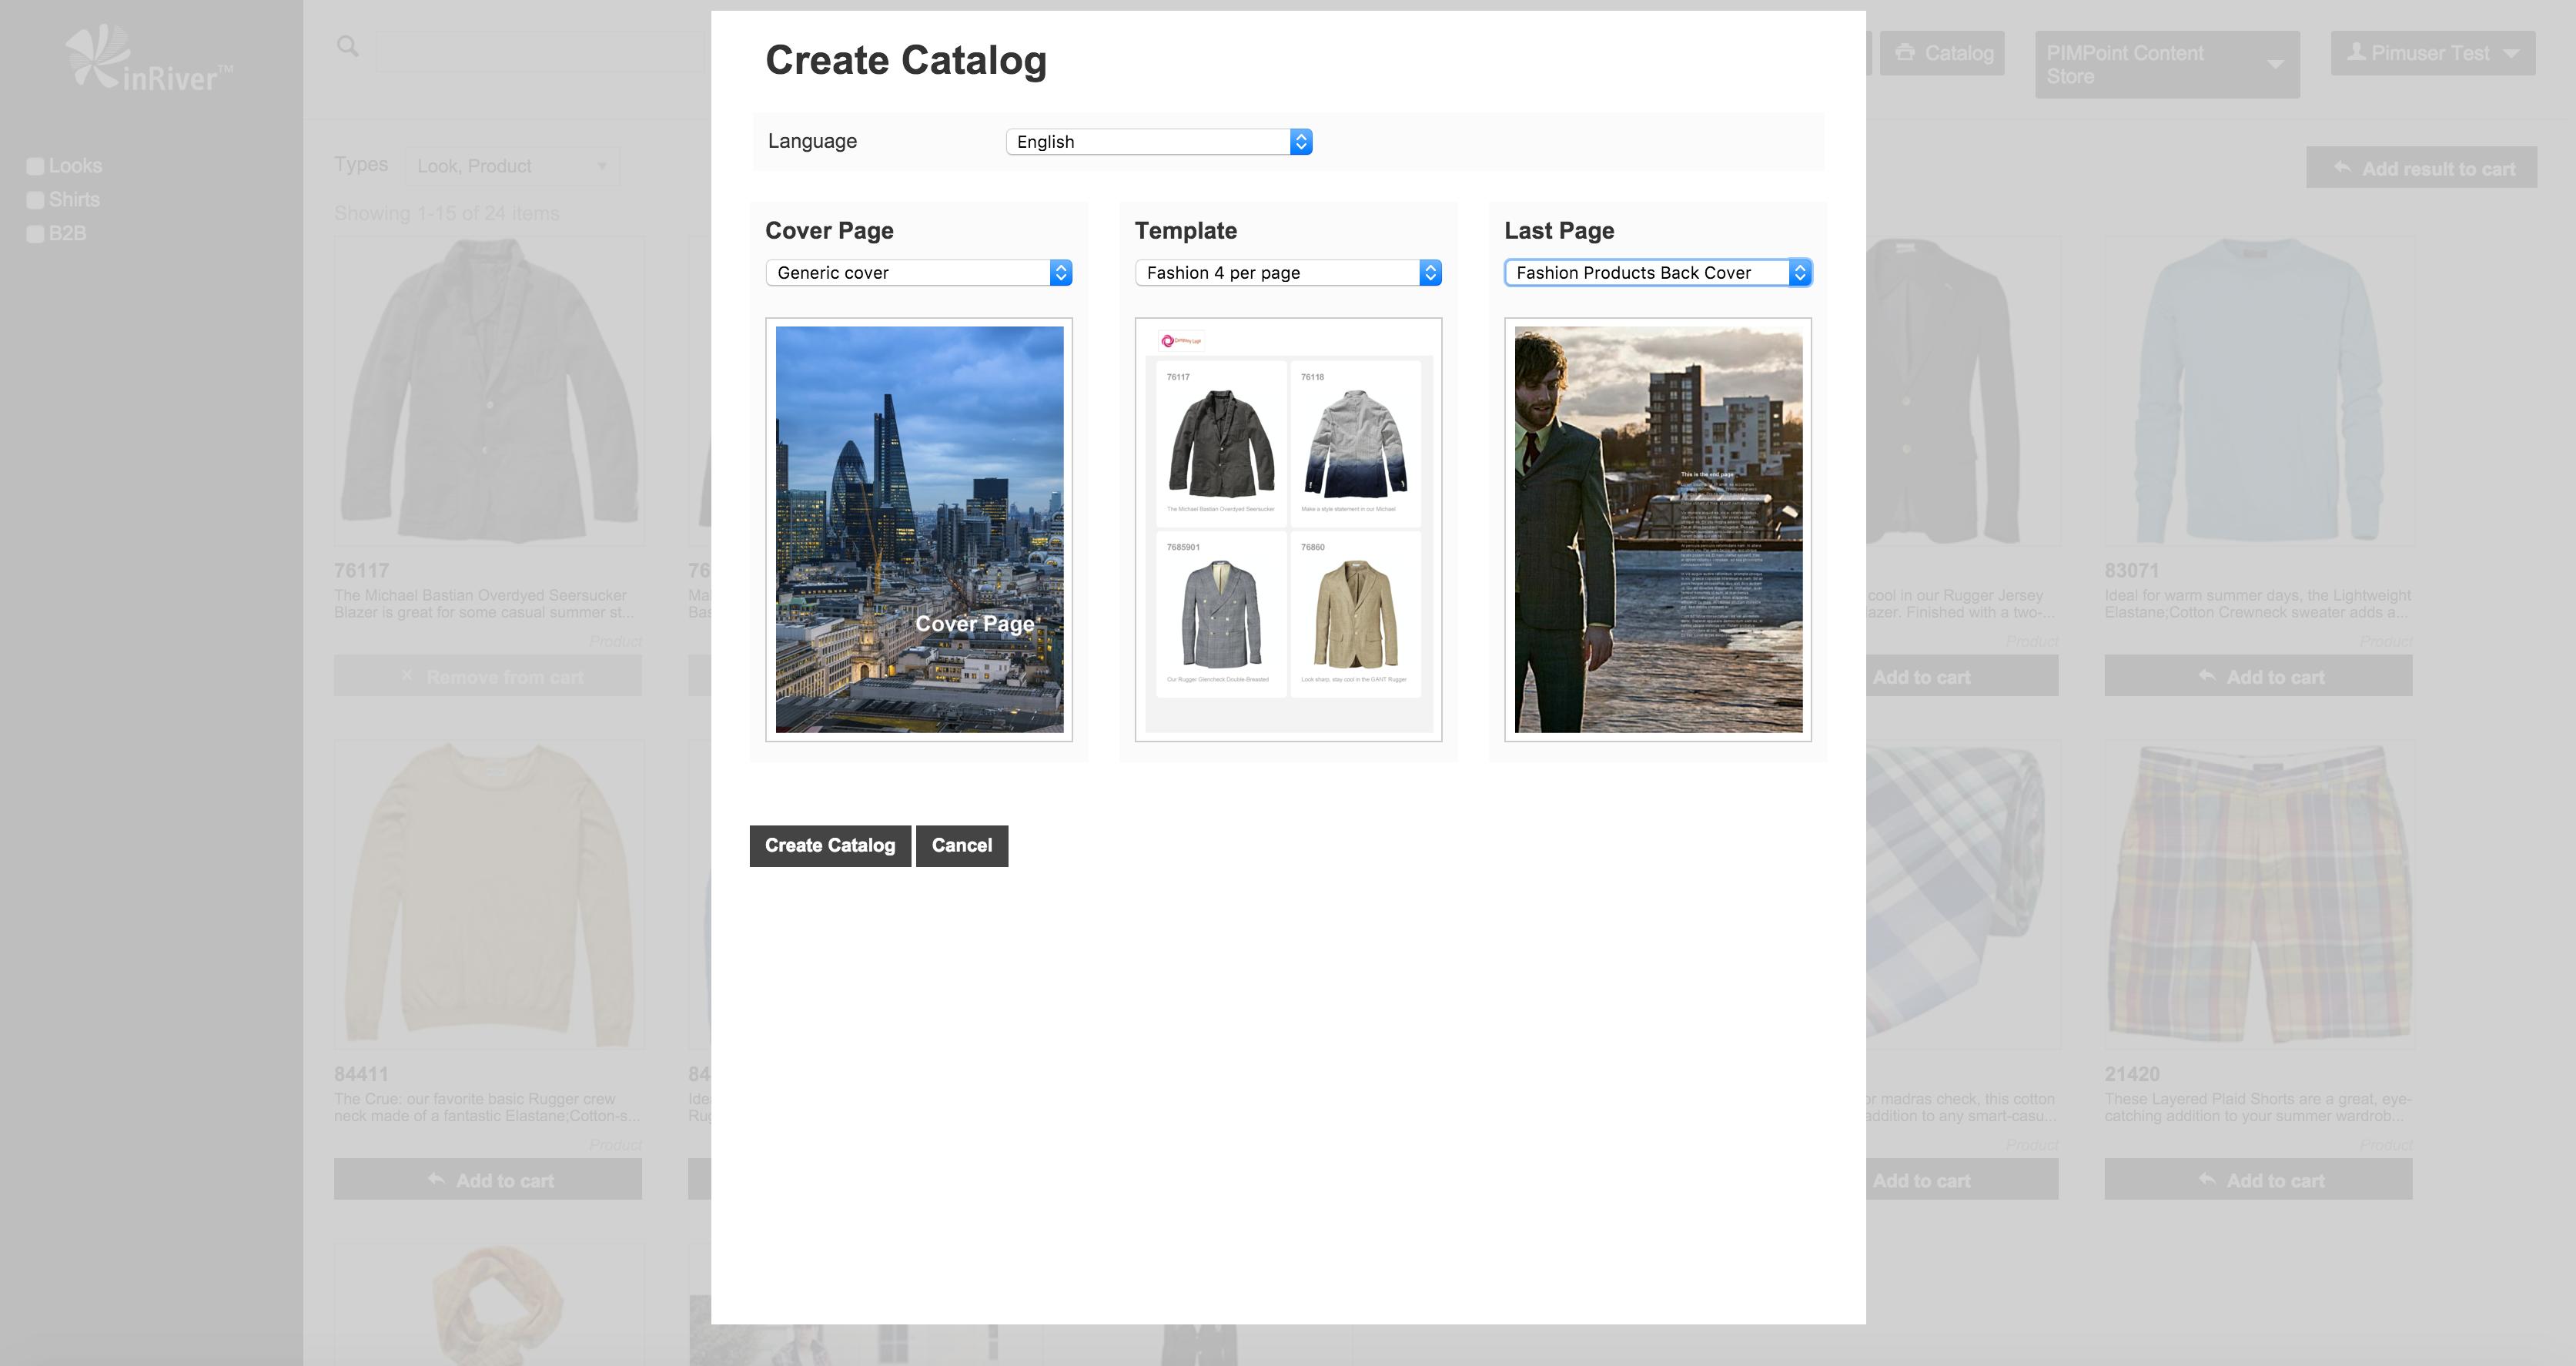 1750inriver-content-store-catalog.png